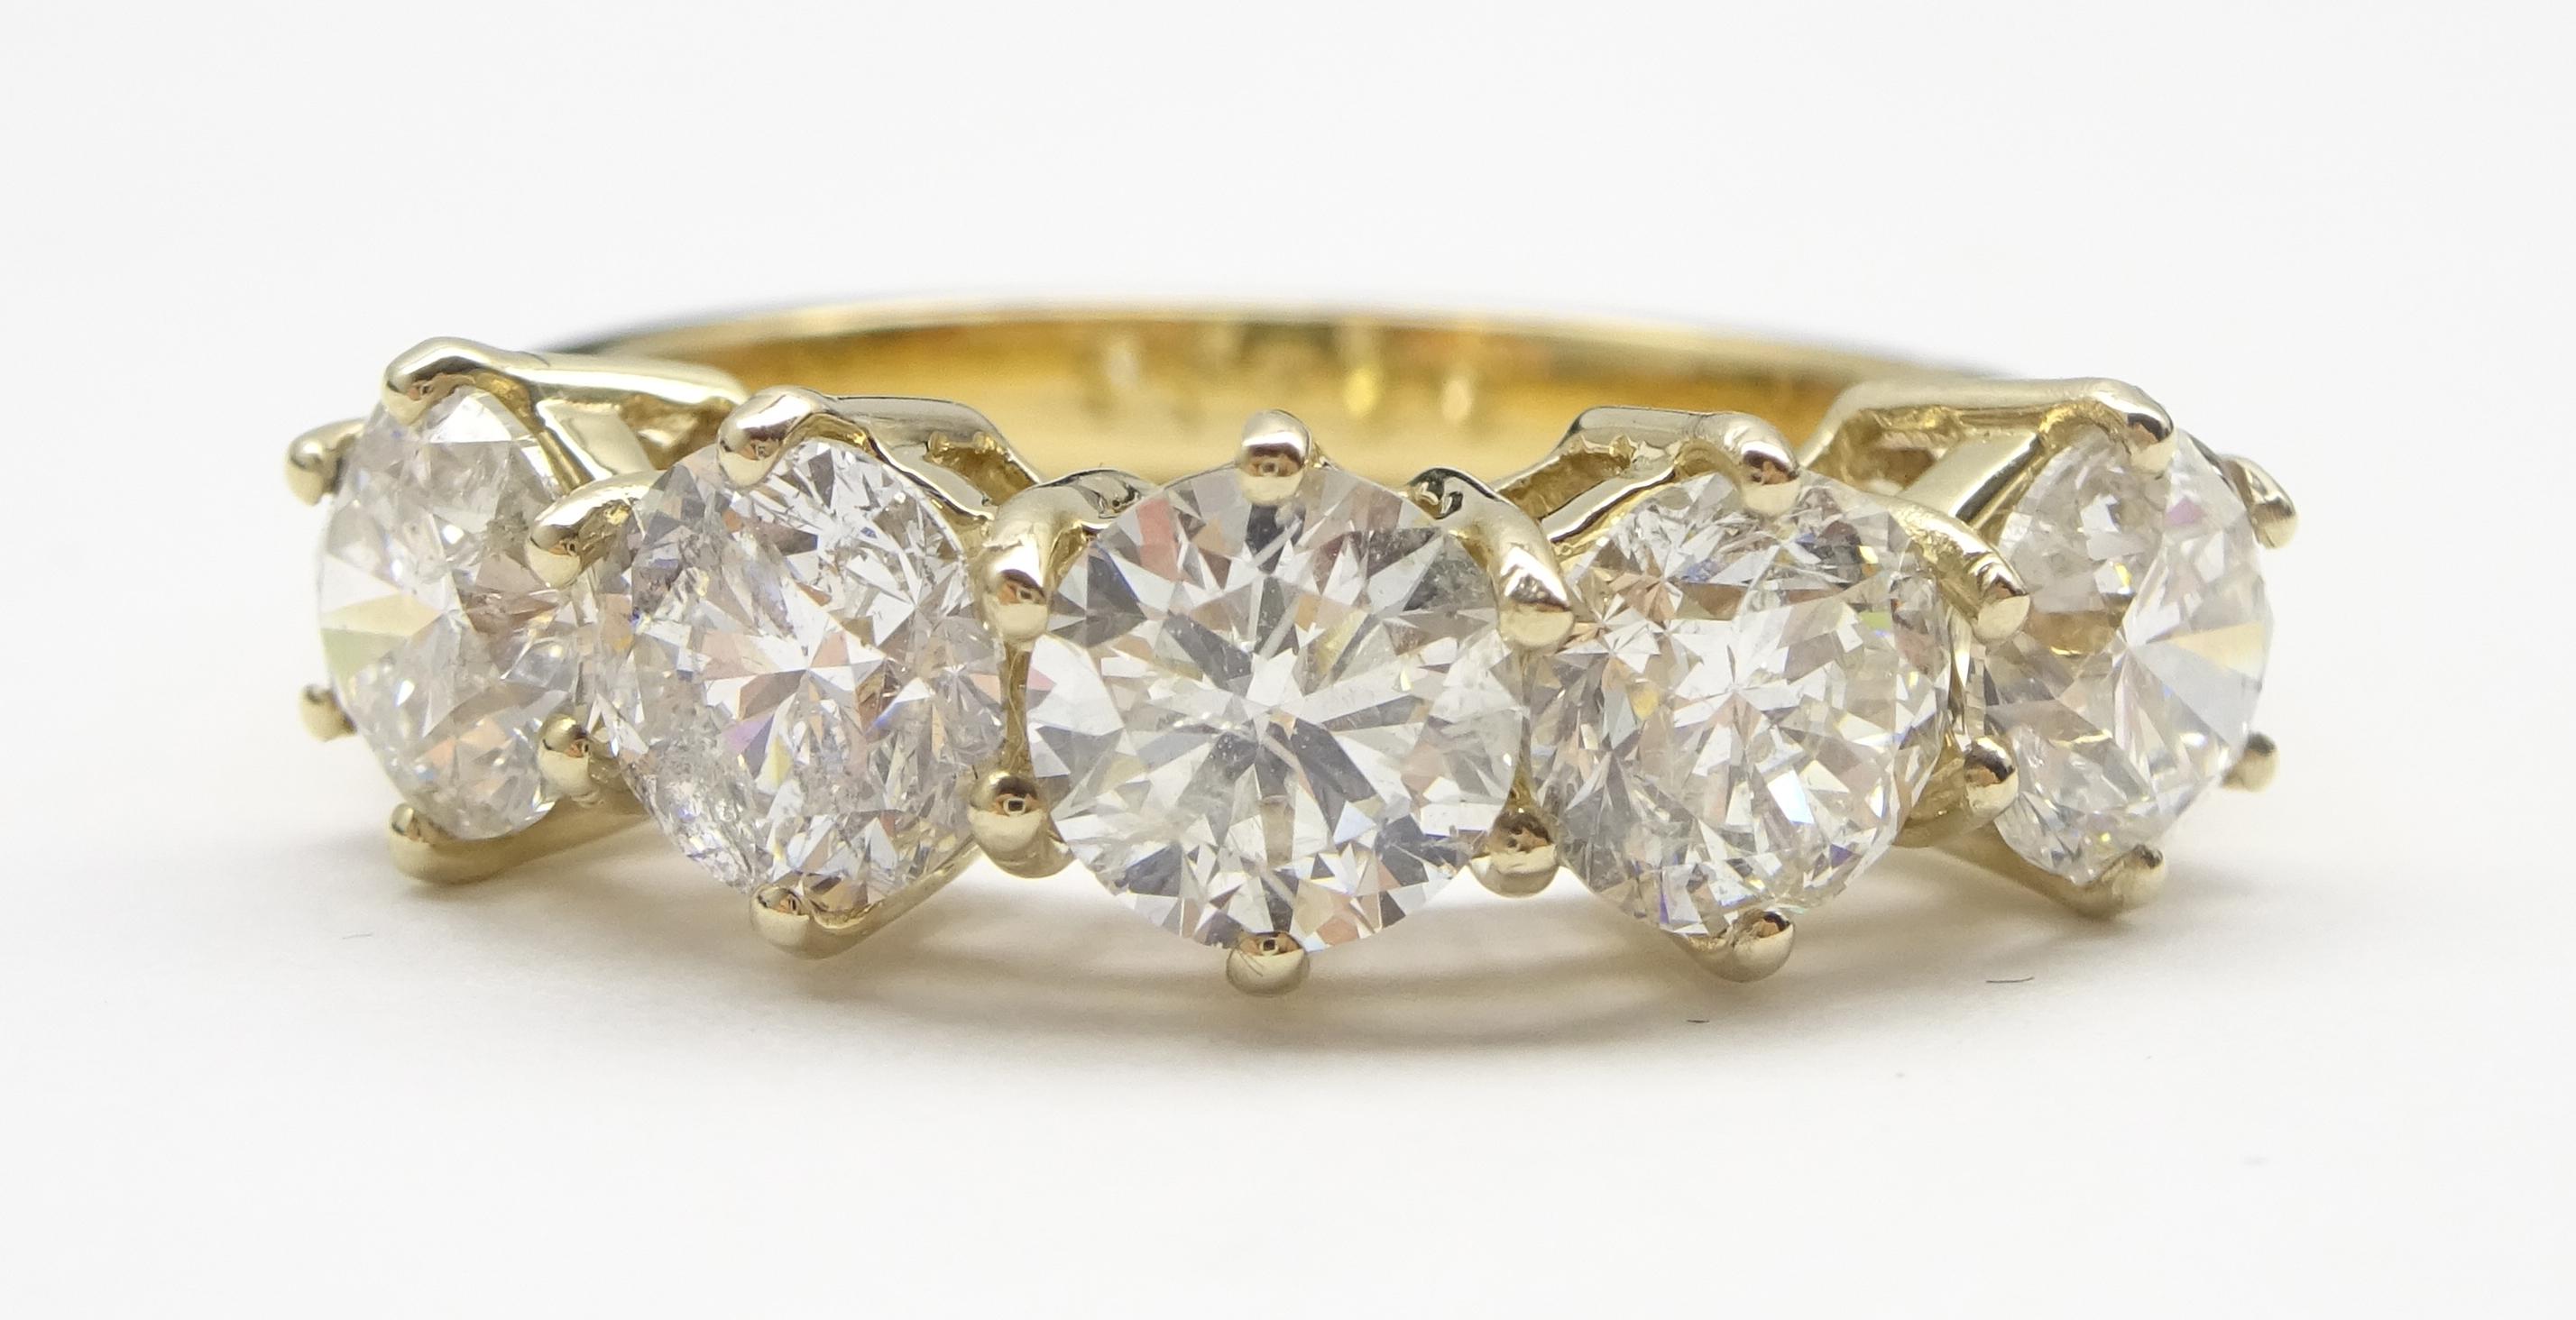 Lot 1012 - 18ct gold five stone round brilliant cut diamond ring hallmarked, total diamond weight 2.